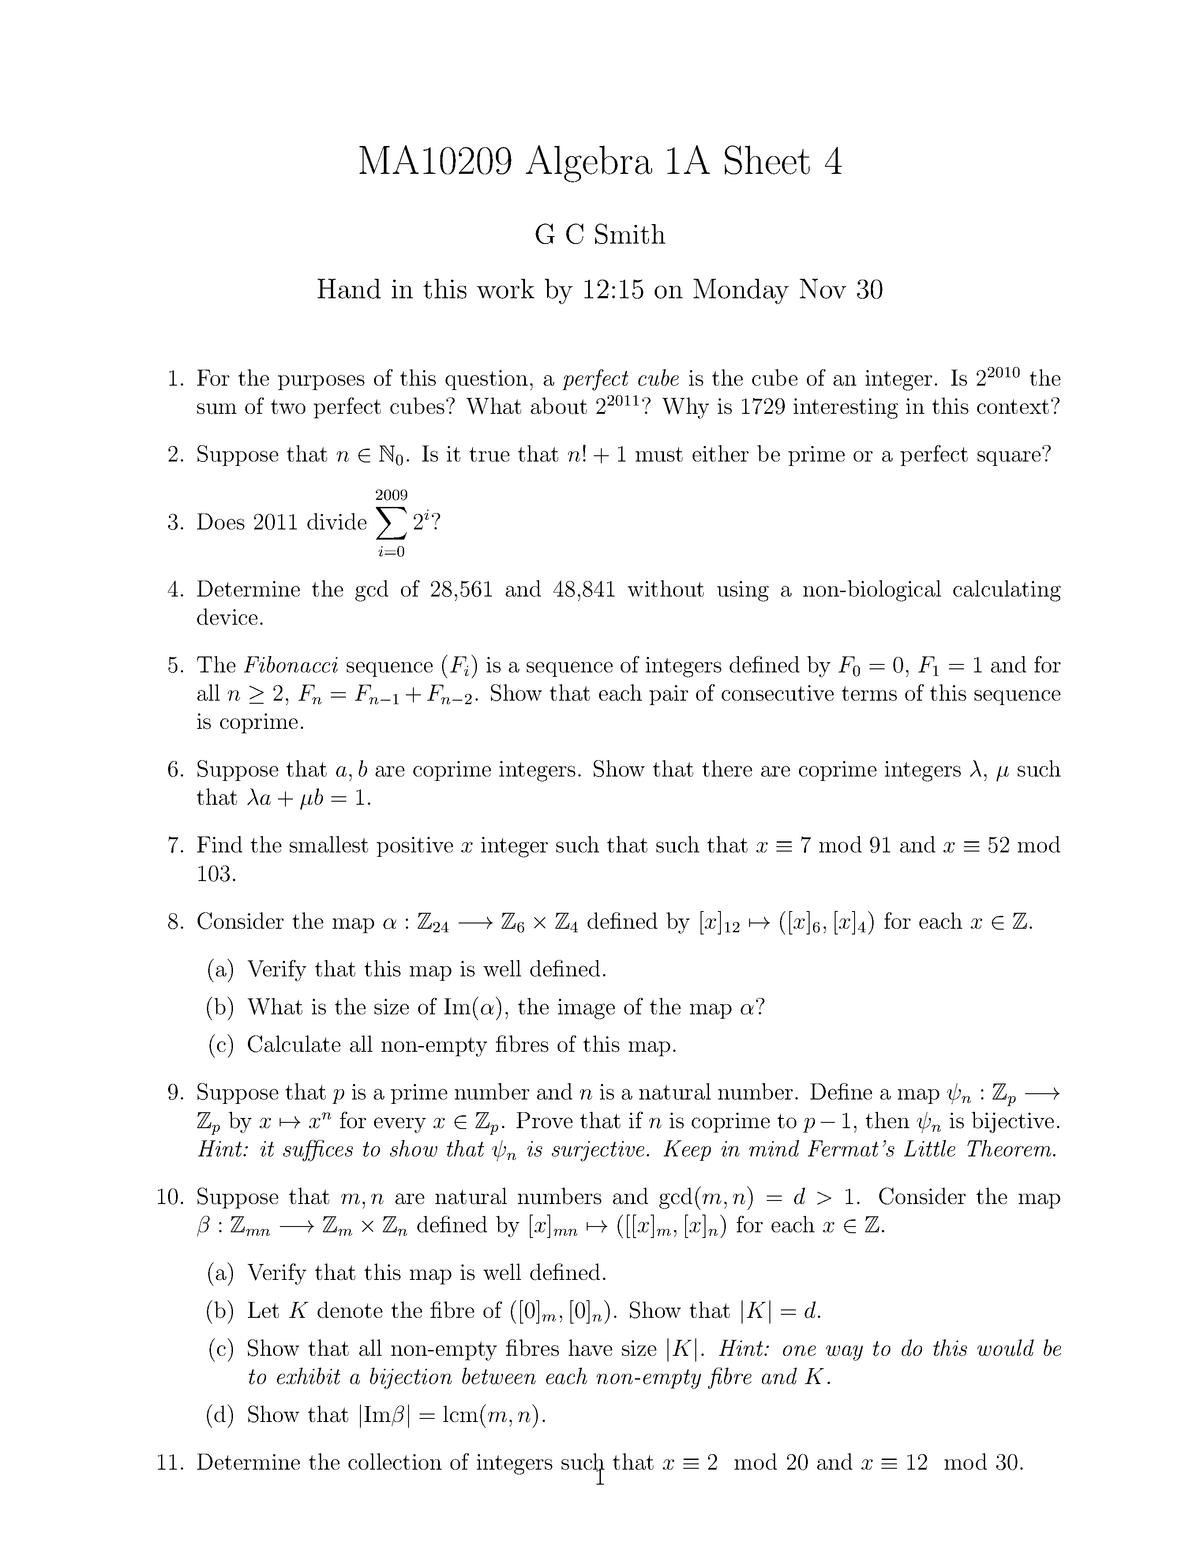 MA10209 2009-2010 Problem Sheet 4 - MA10209: Algebra 1A